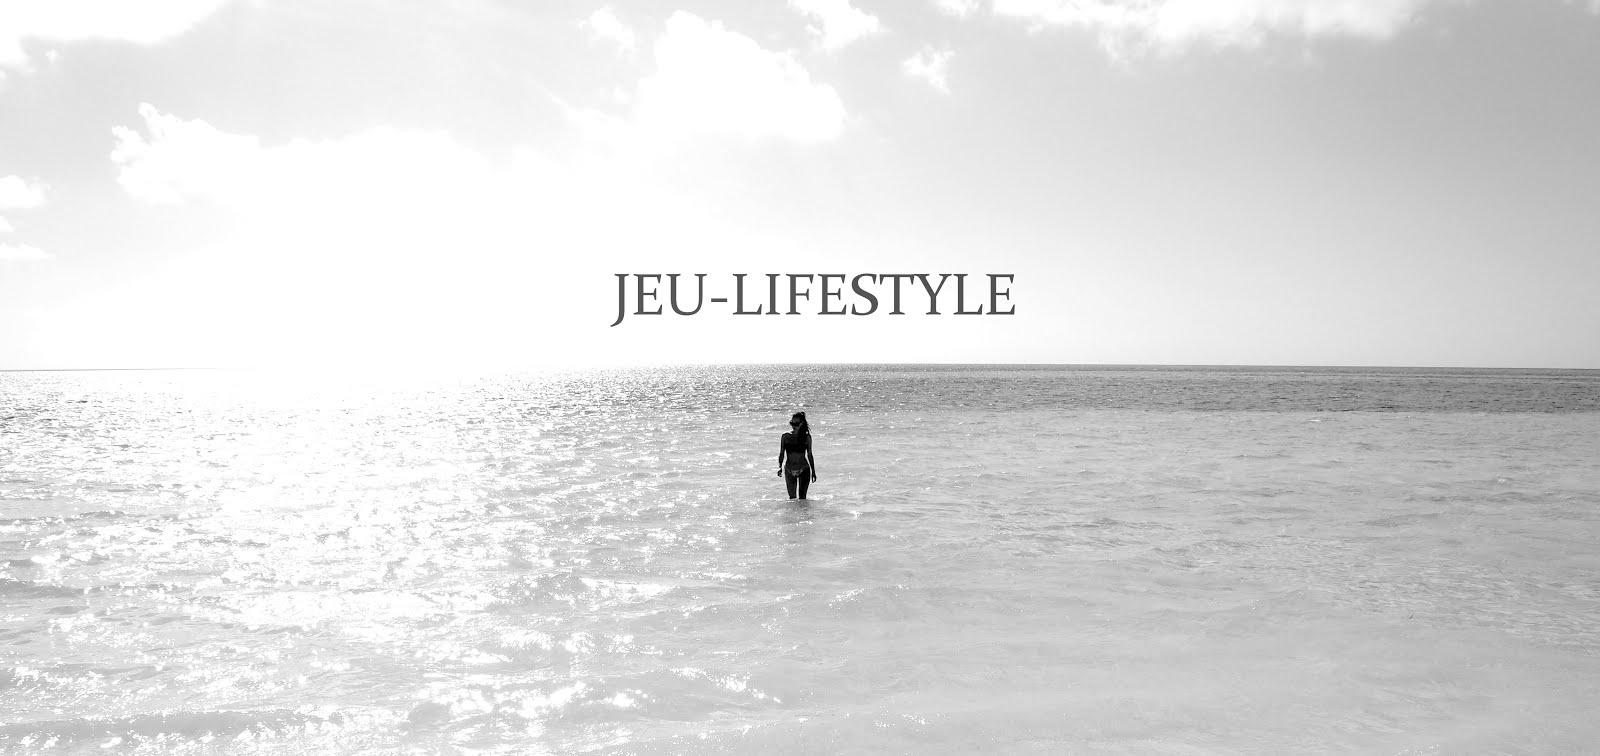 jeu-lifestyle